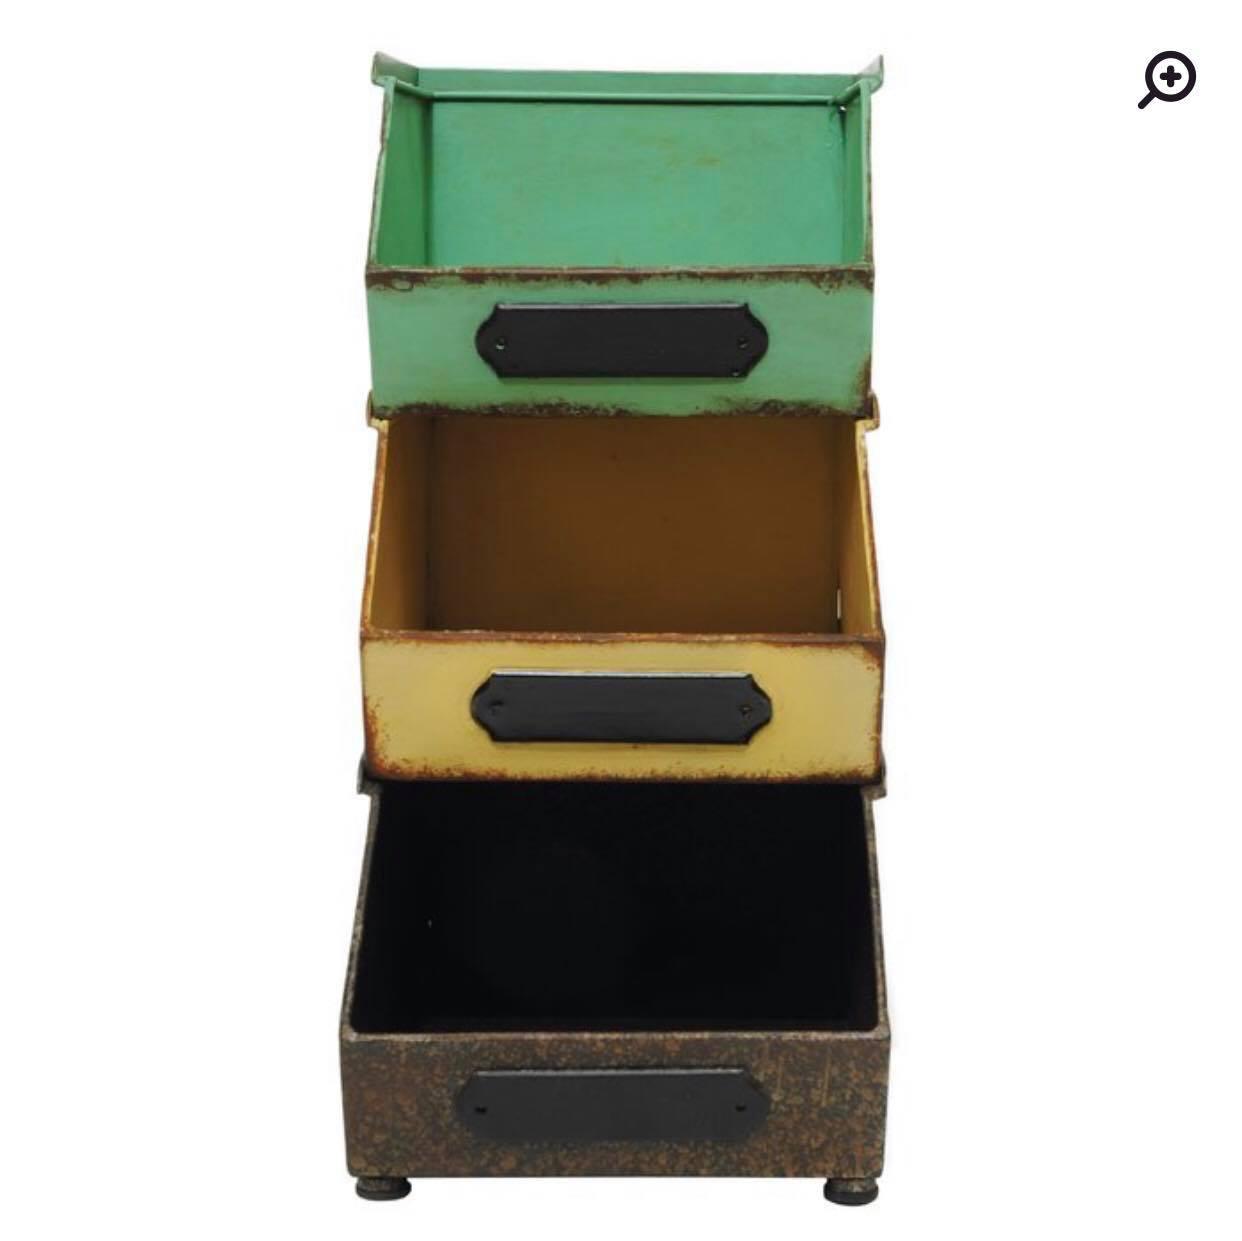 Cute stacking bins